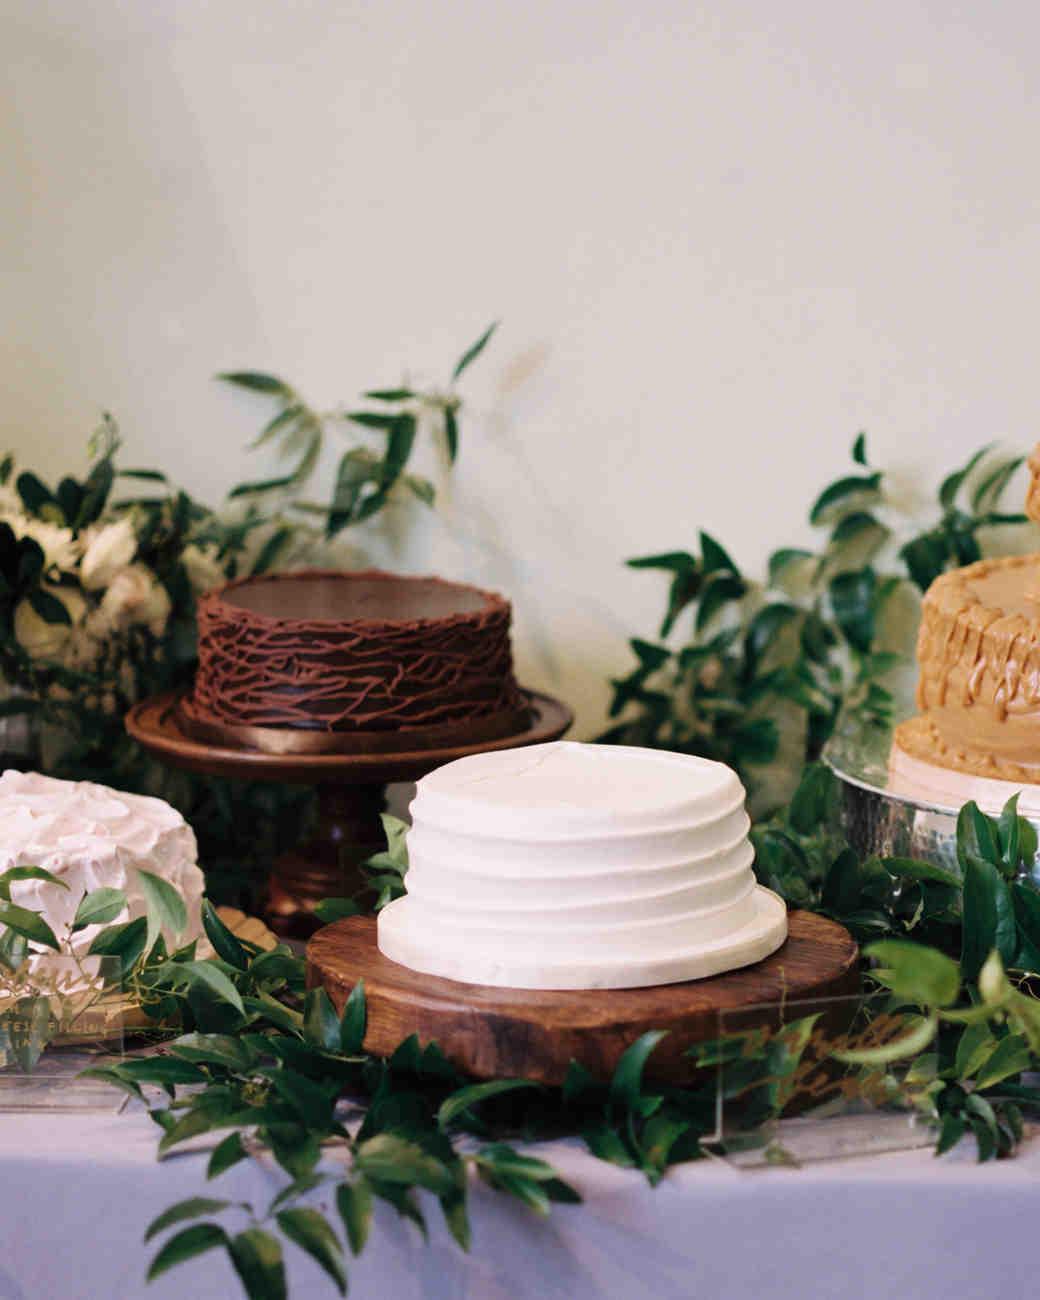 jackie-ross-wedding-cake-087-s111775-0215.jpg